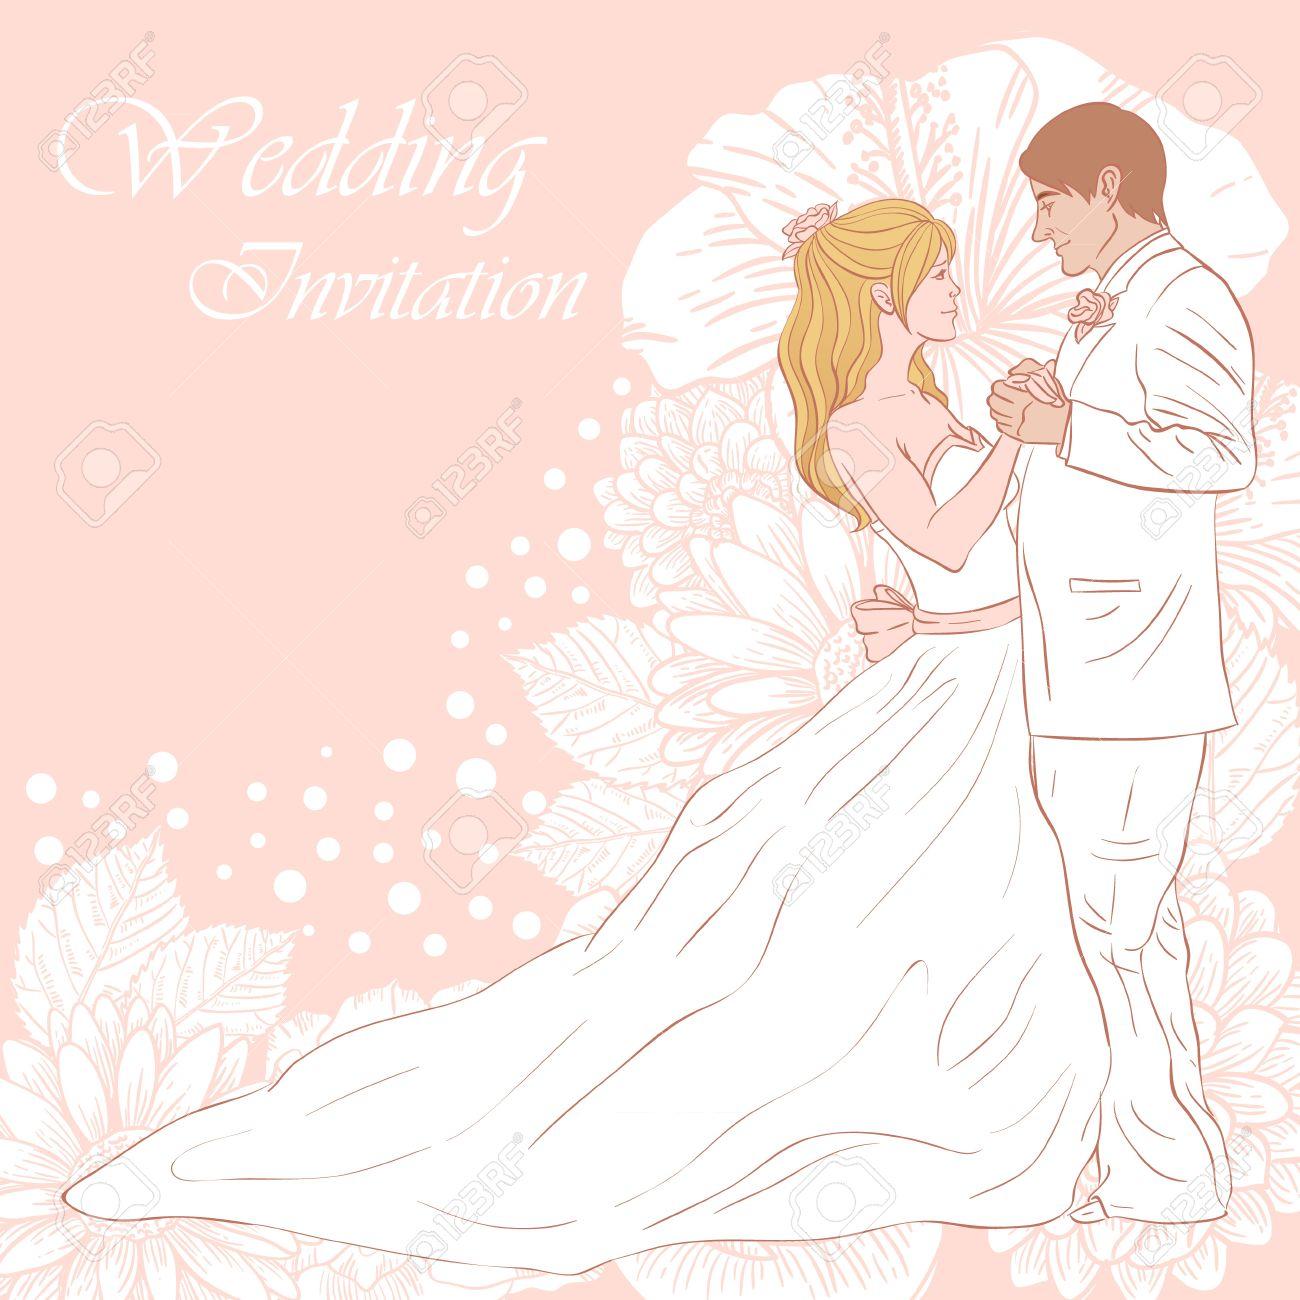 wedding invitation background designs